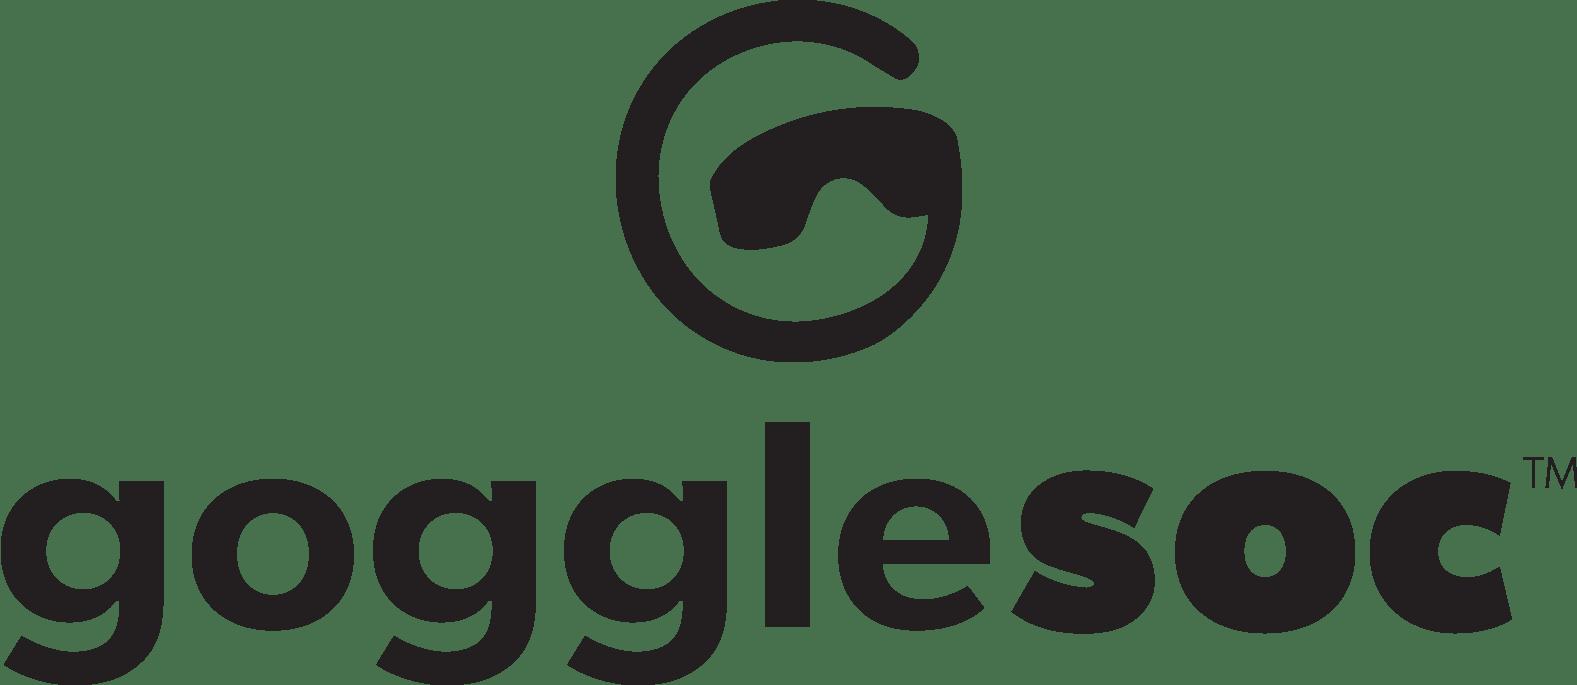 Gogglesoc Full Logo - Black